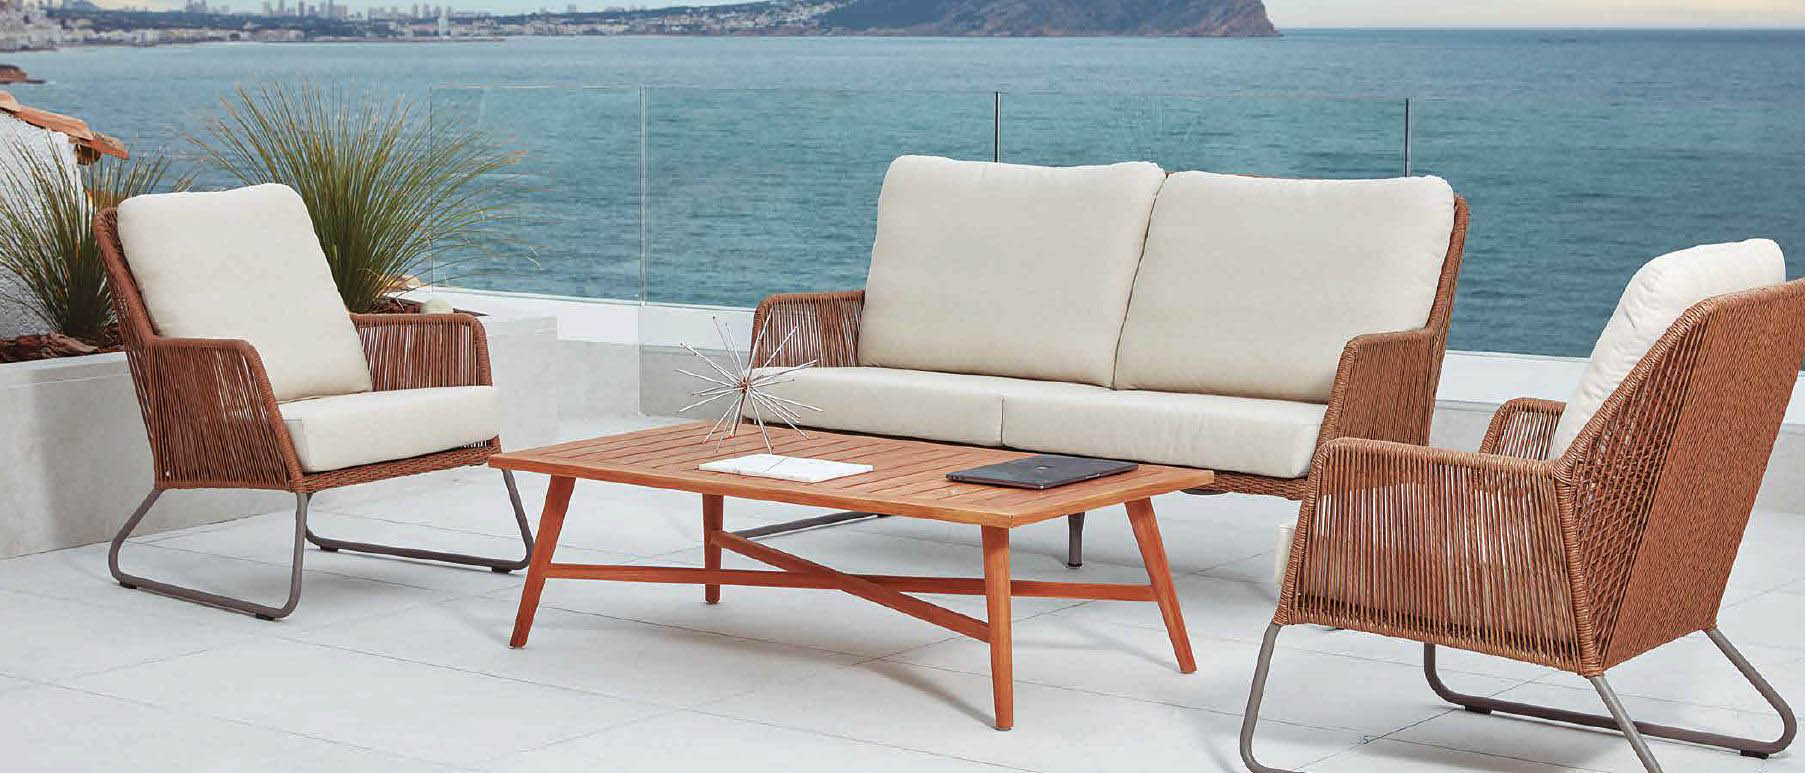 Modernūs lauko baldai sofa staliukas Allanis